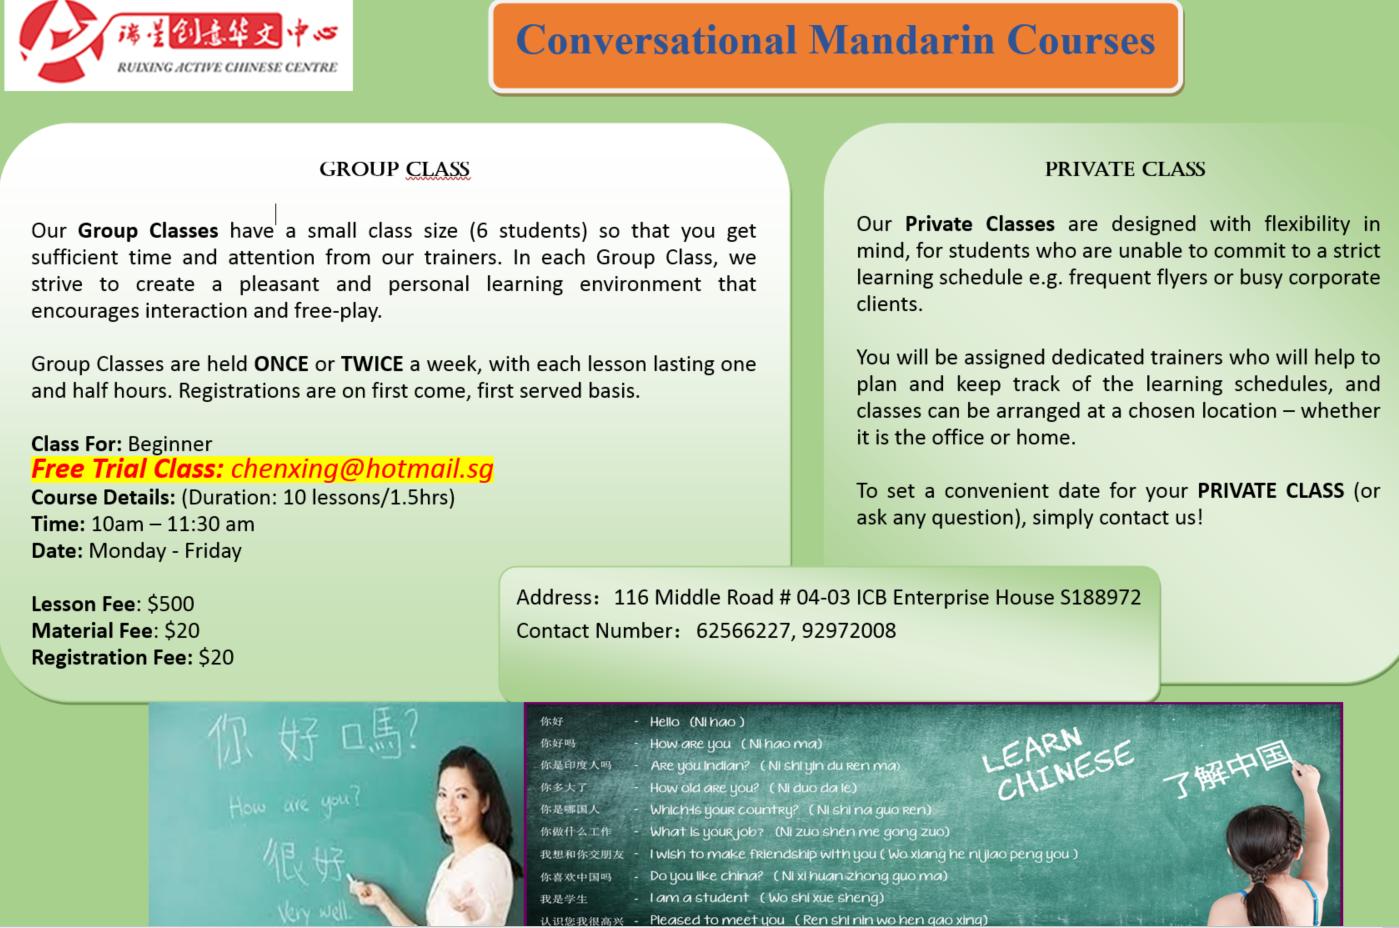 Conversational Mandarin Courses